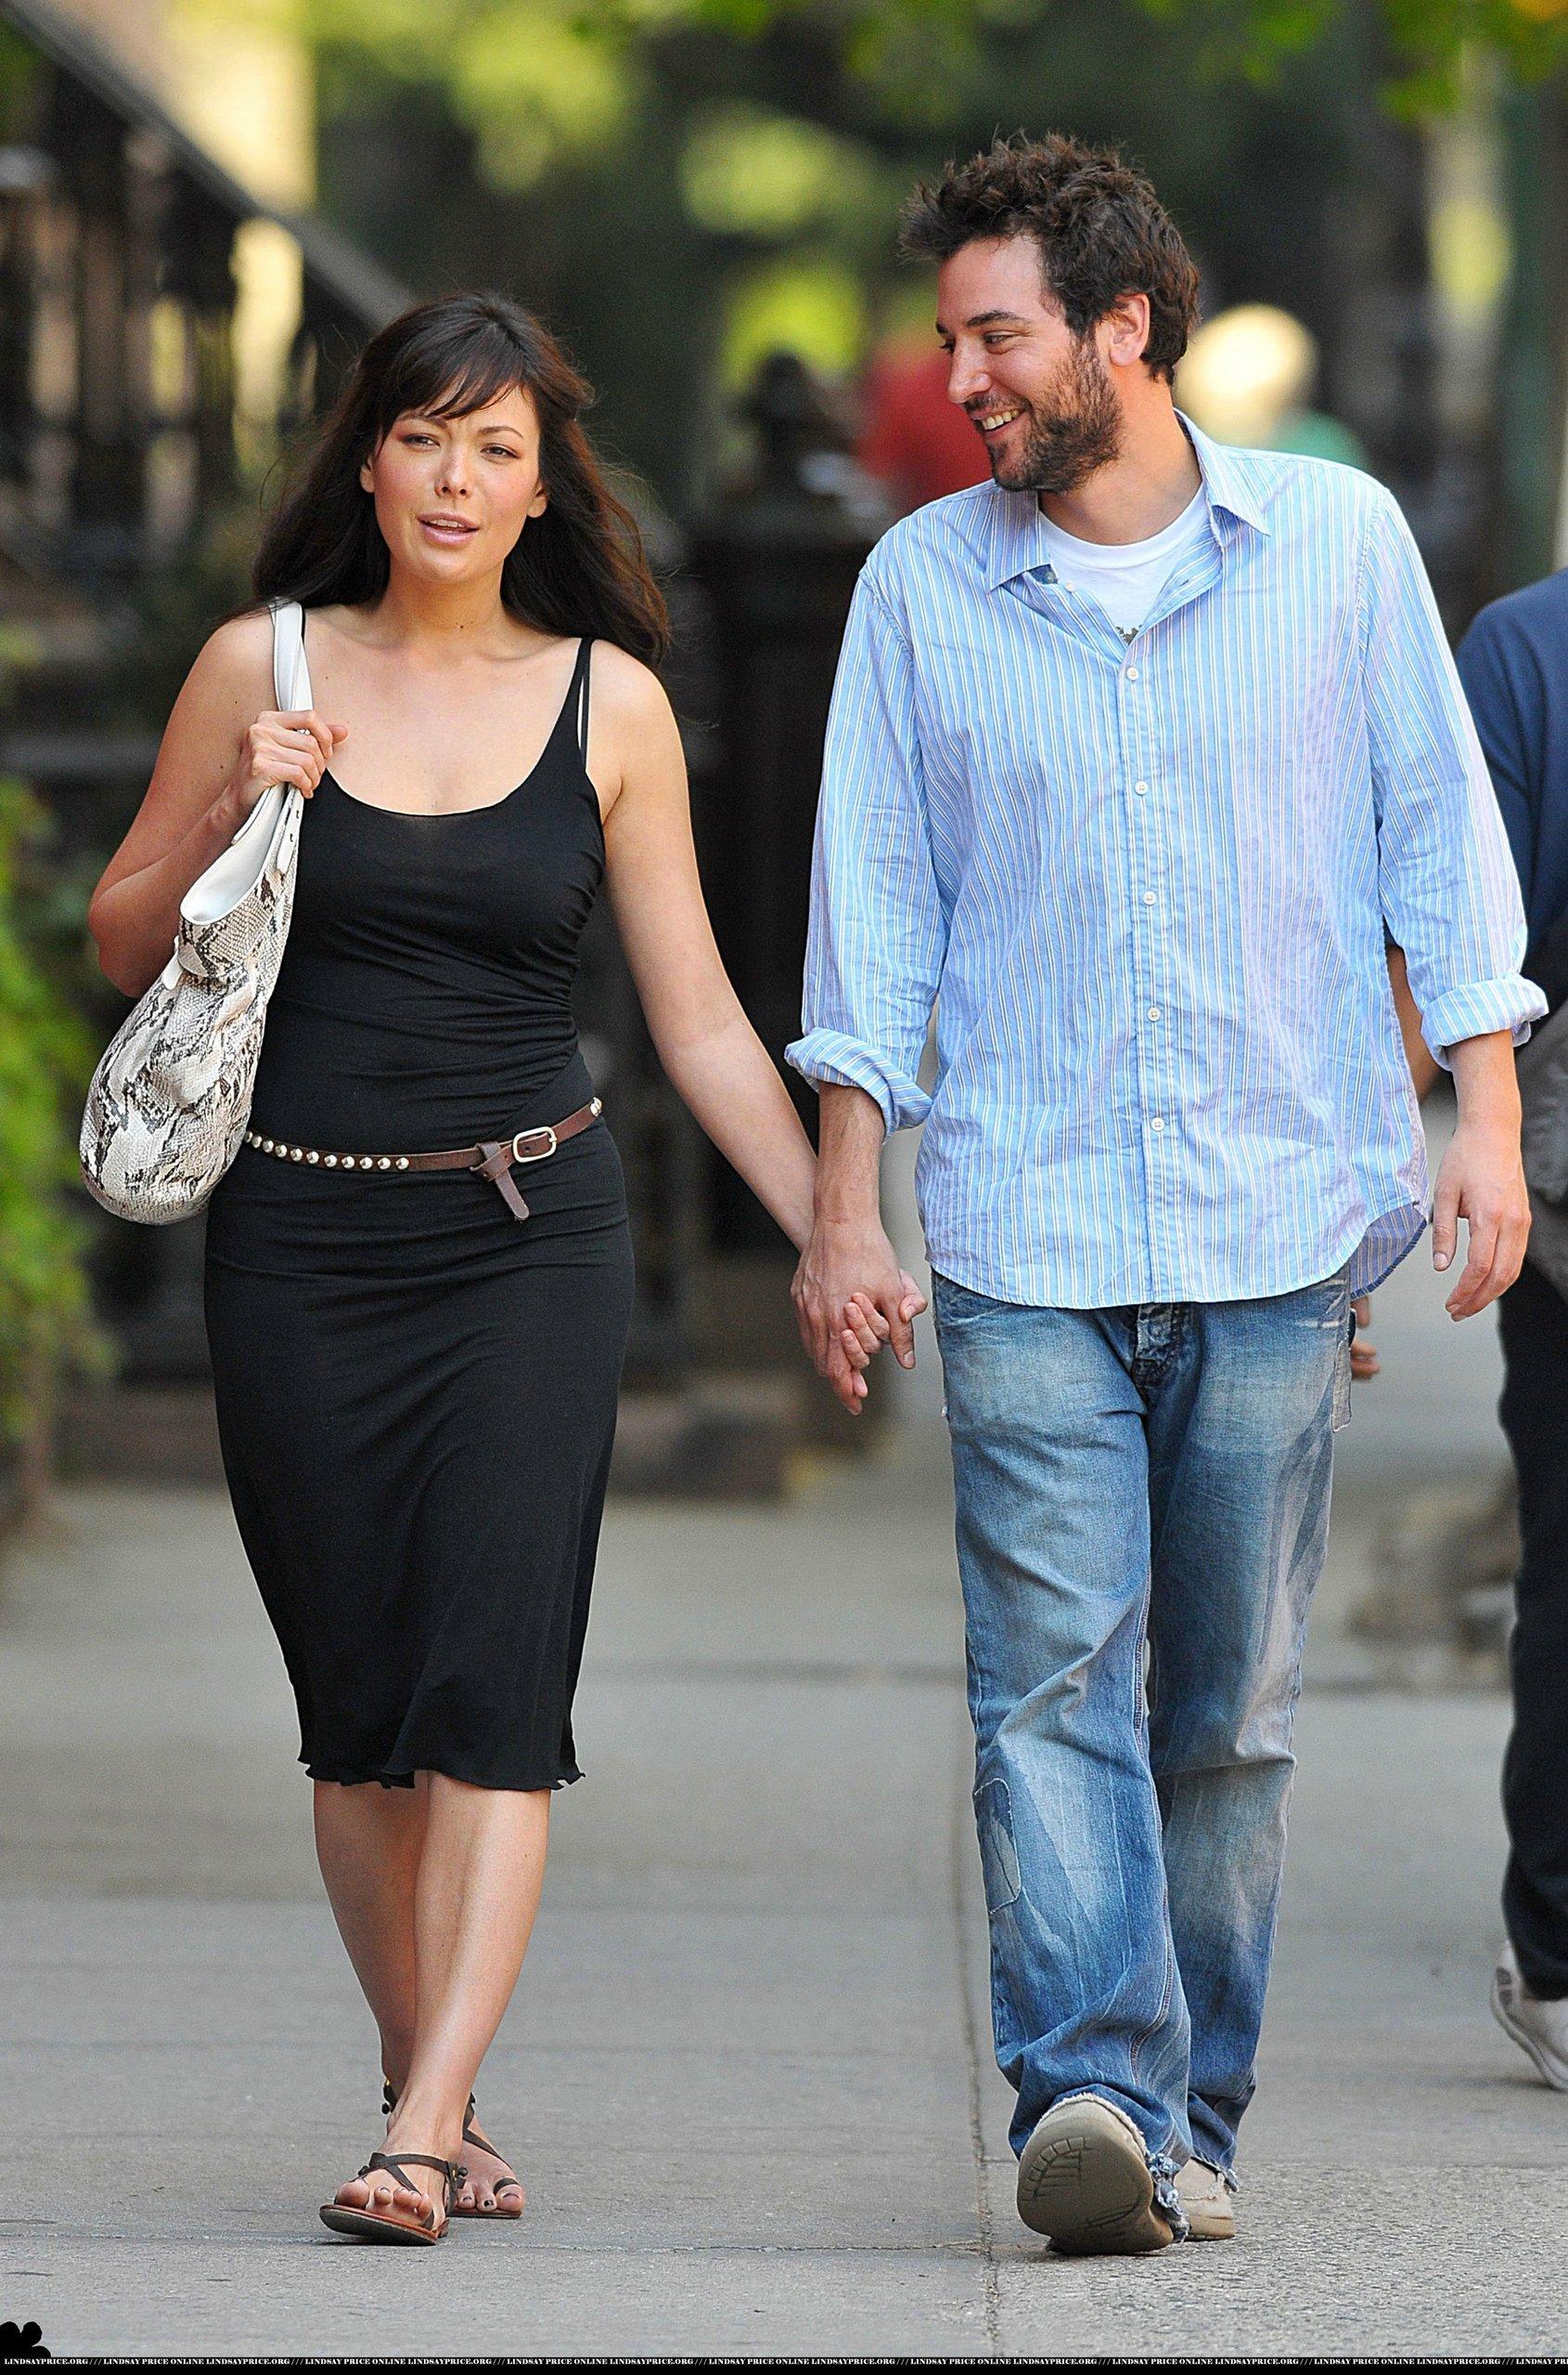 josh radnor dating now Amazoncom: how i met your mother: season 2: josh radnor, jason segel, neil patrick harris, cobie smulders, alyson hannigan: movies & tv.